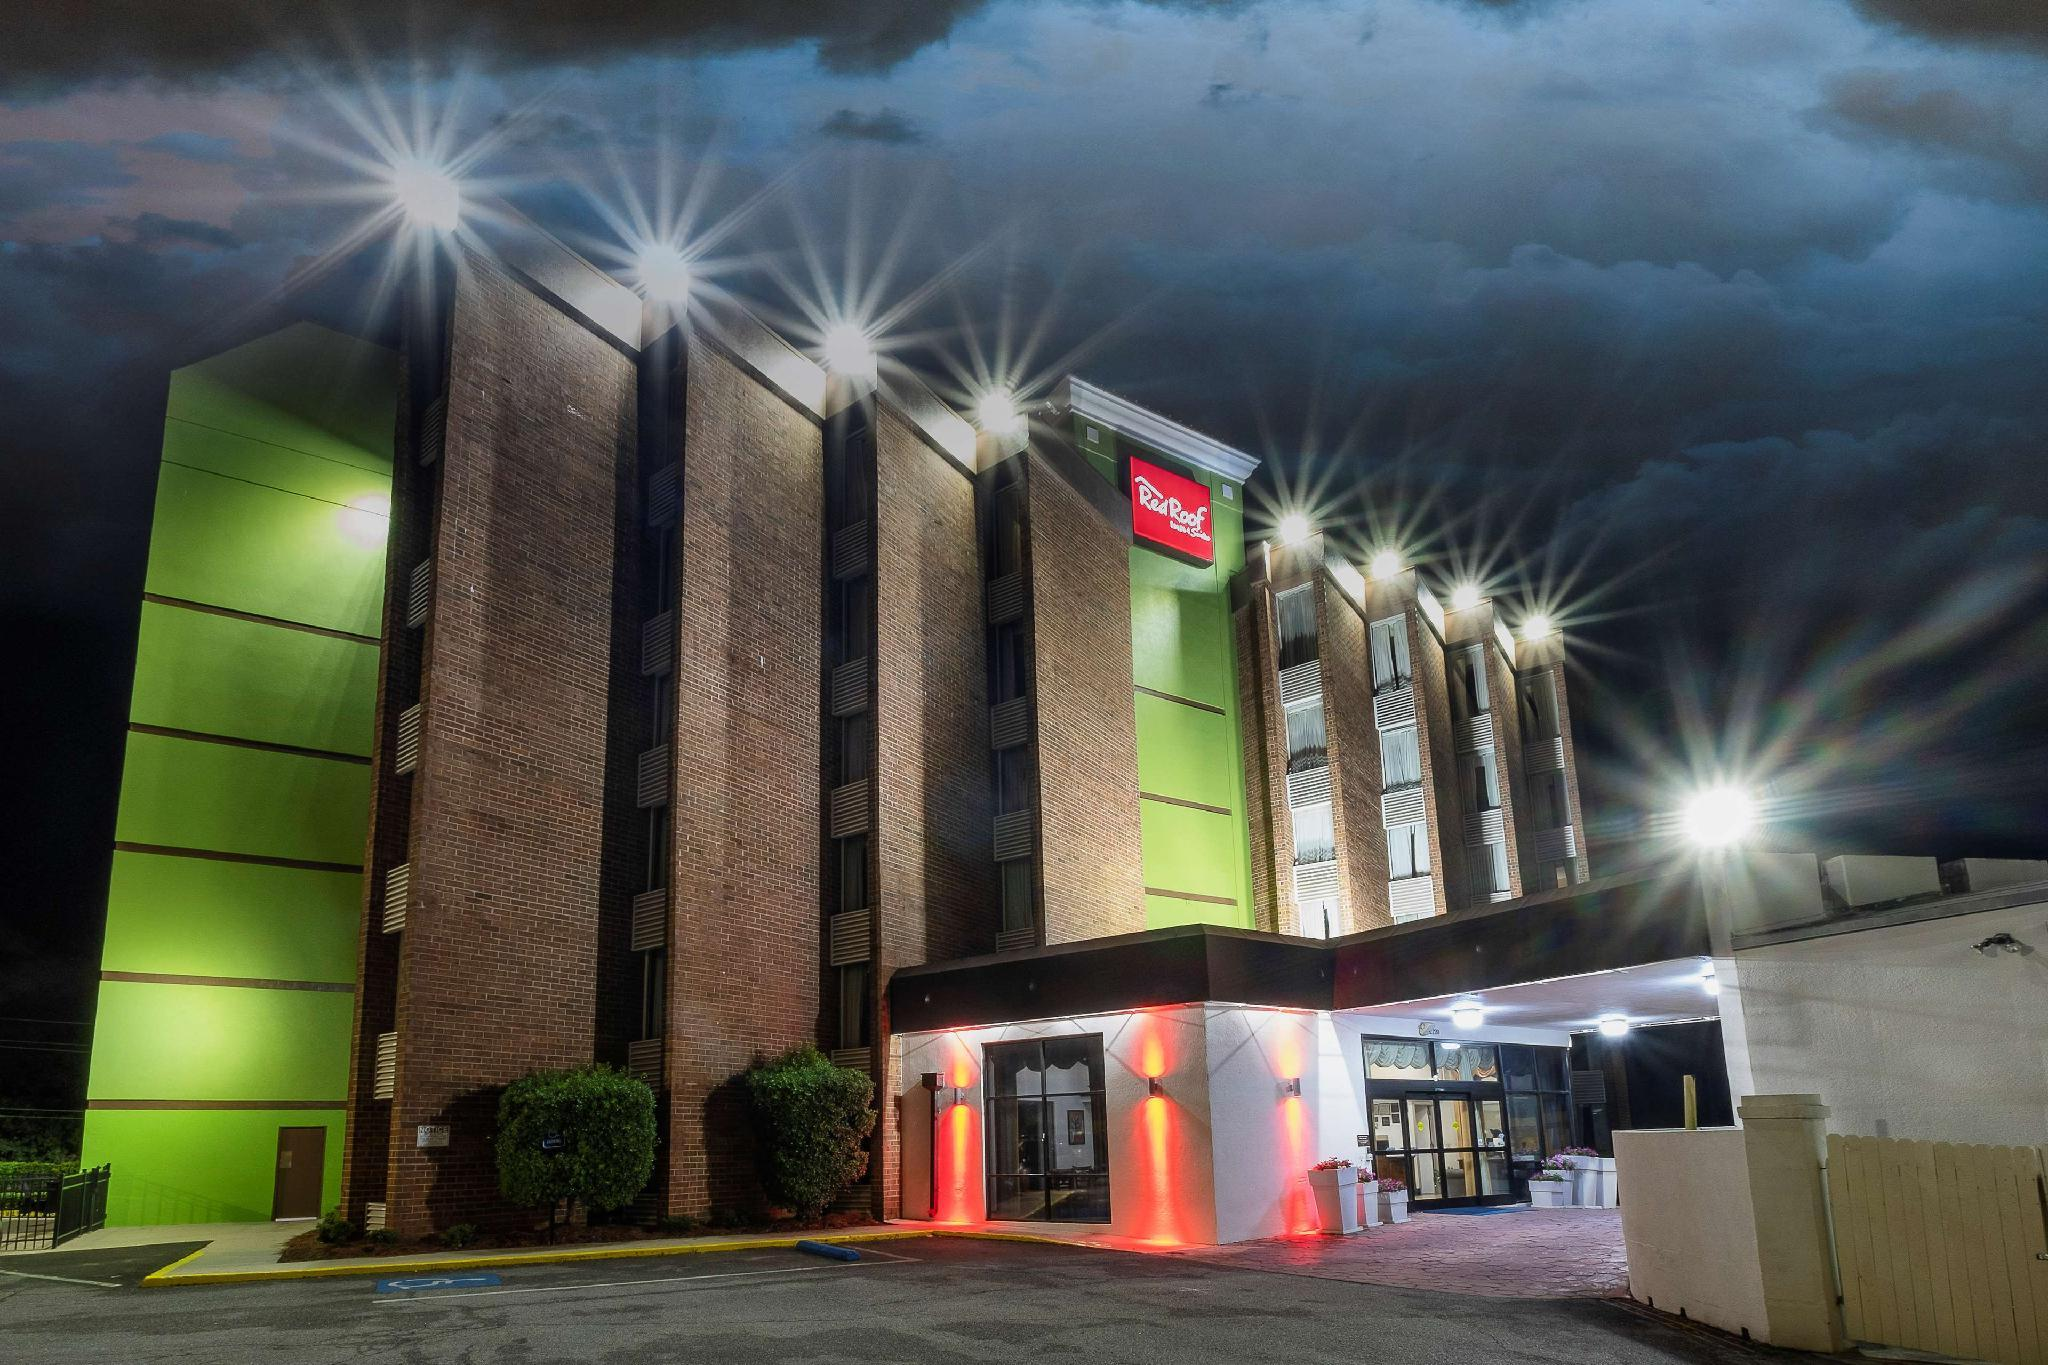 Red Roof Inn & Suites Macon, Bibb